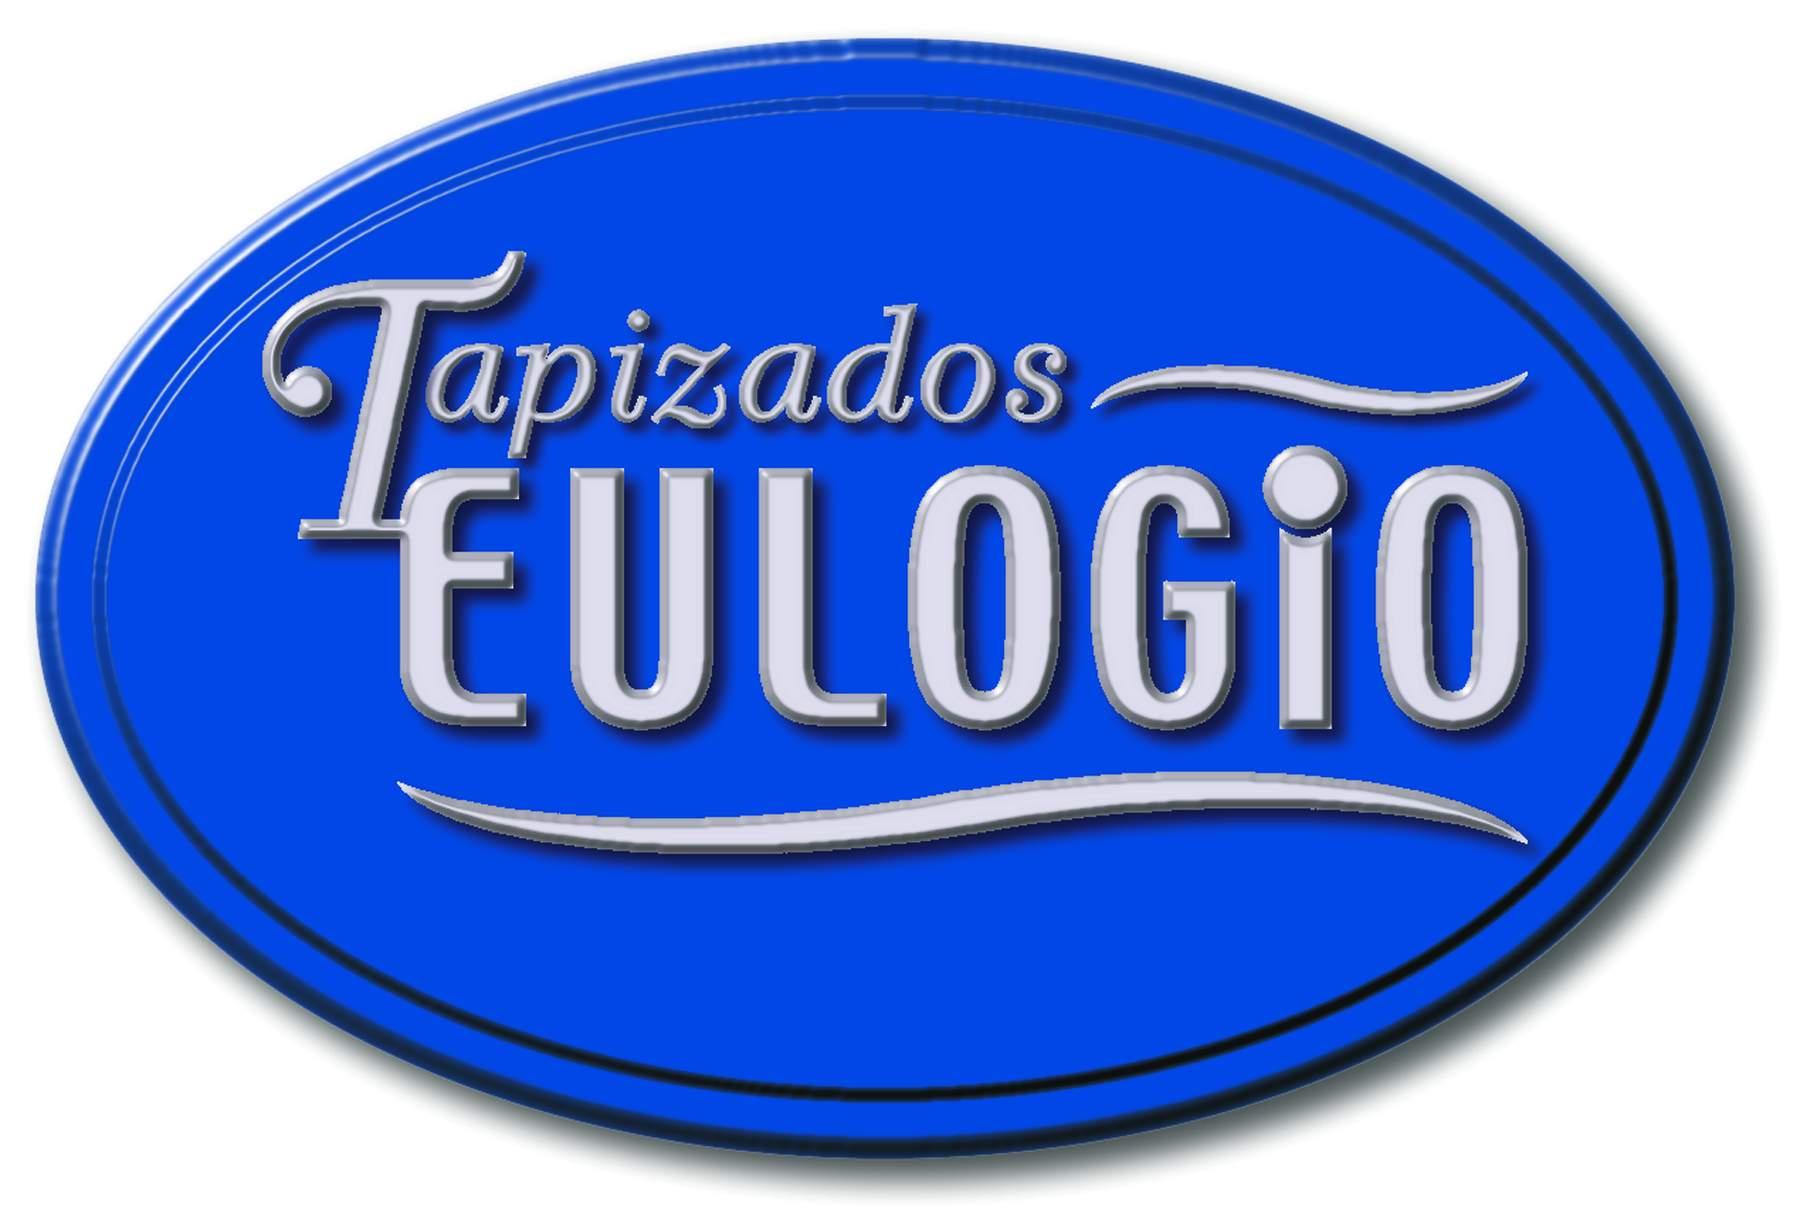 Tapizados Eulogio, S.l.l.